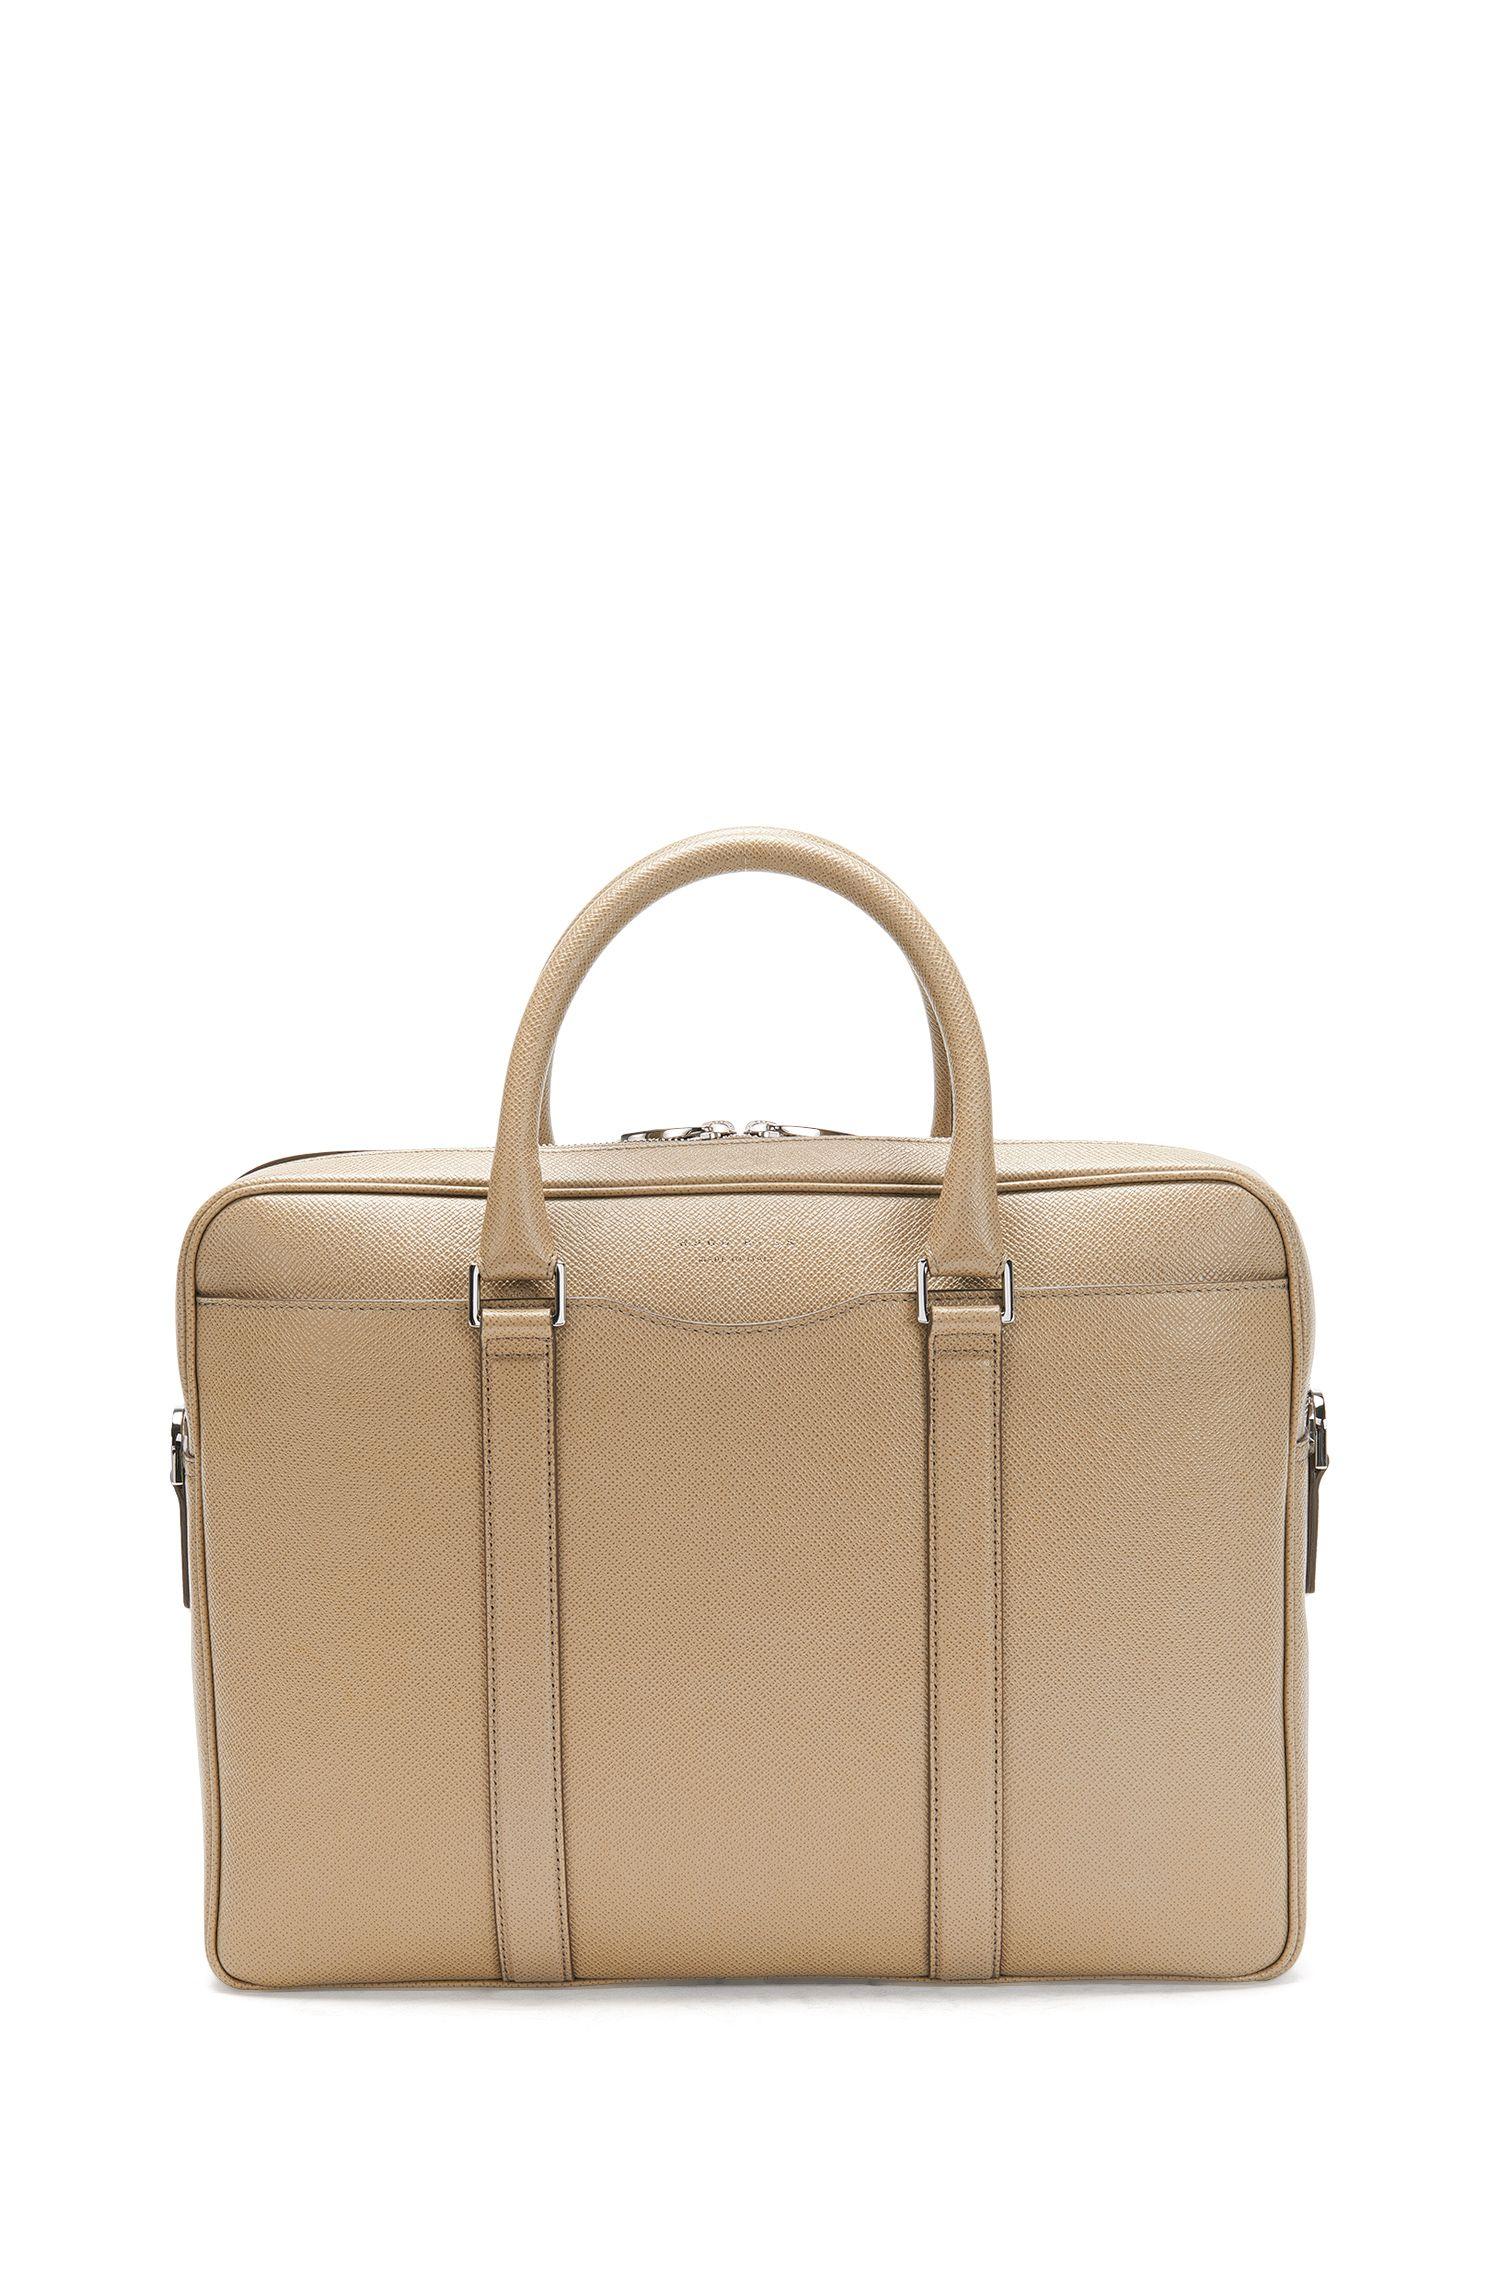 'Signature S Doc' | Italian Calfskin Workbag, Detachable Shoulder Strap